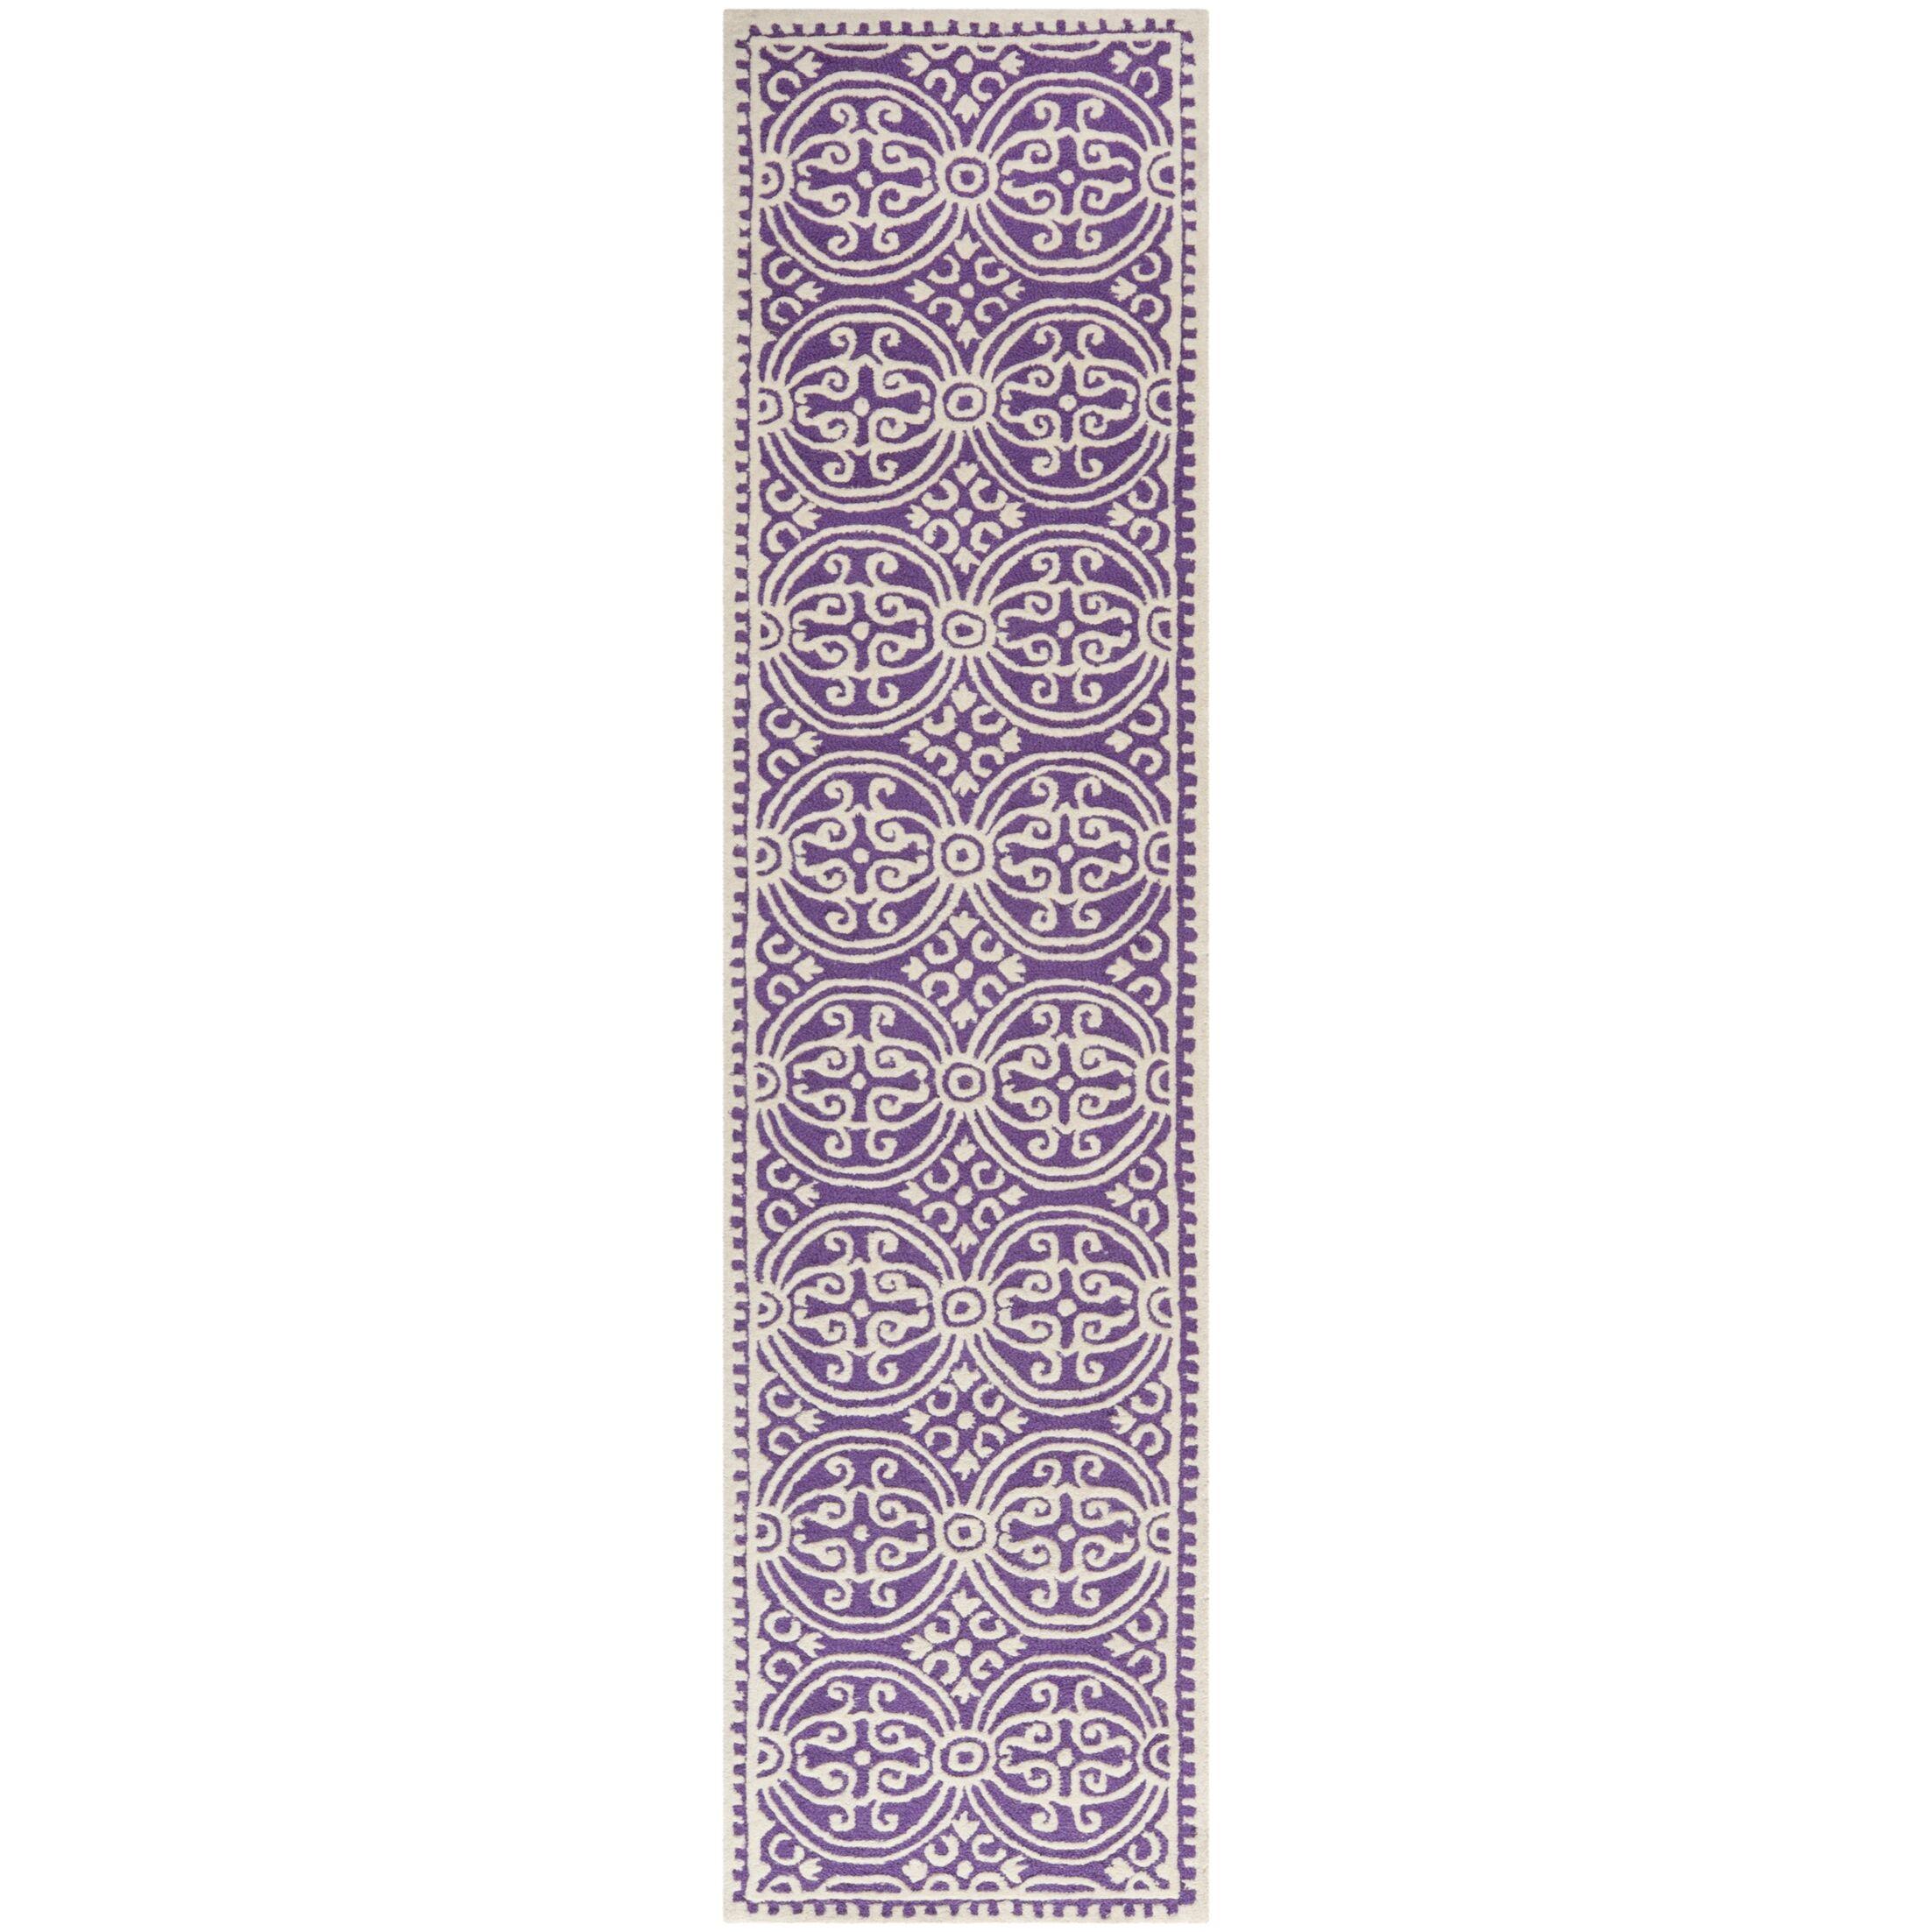 Fairburn Purple   Area Rug Rug Size: Runner 2'6